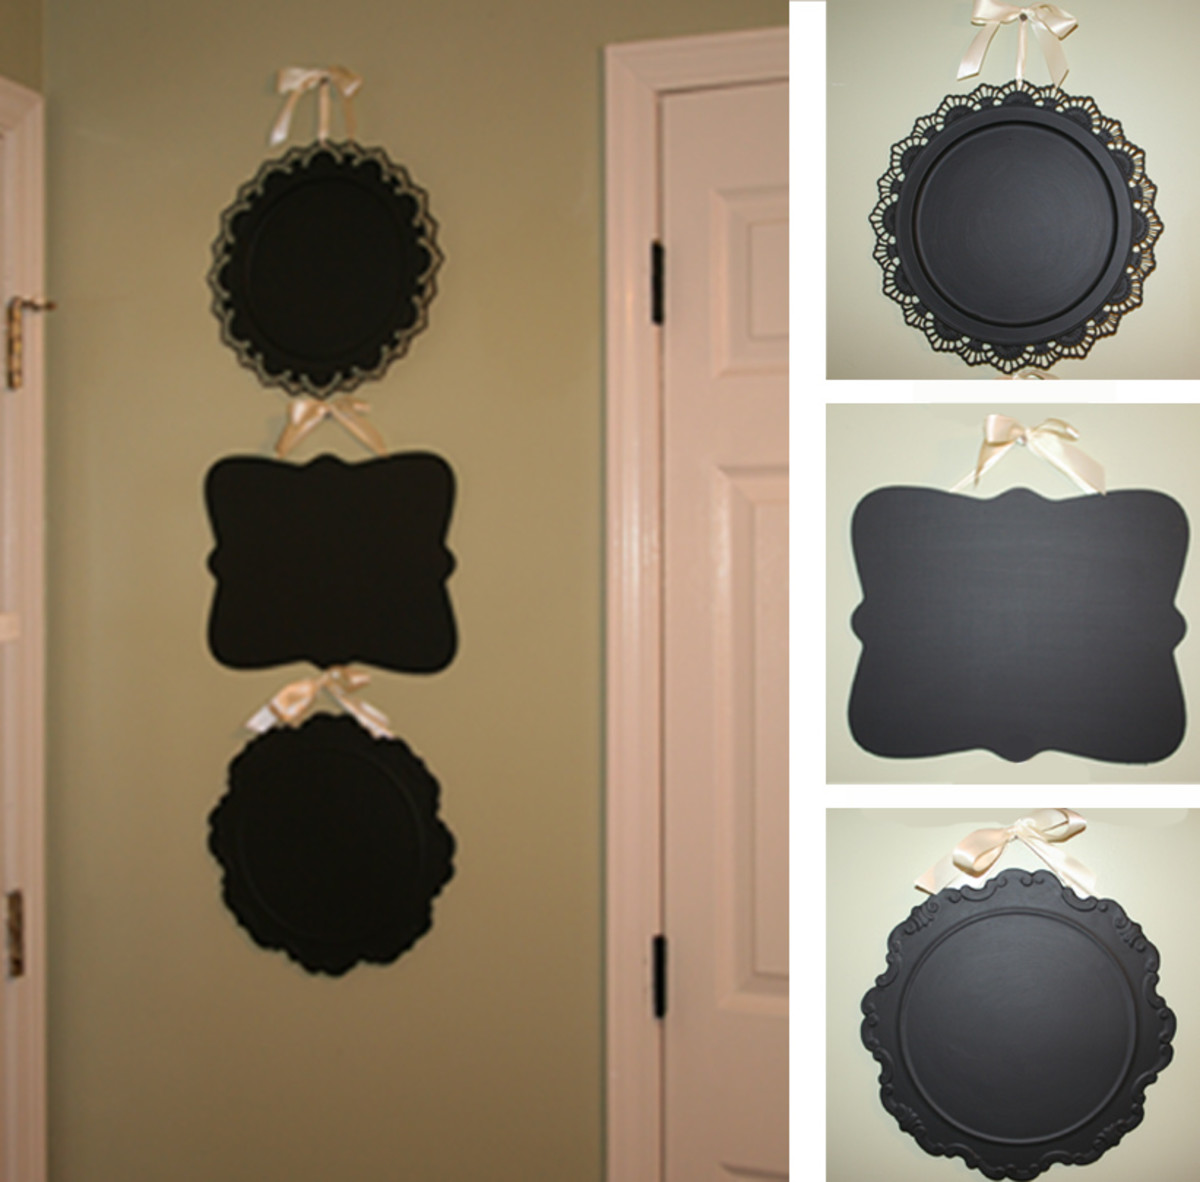 Hanging Chalkboards